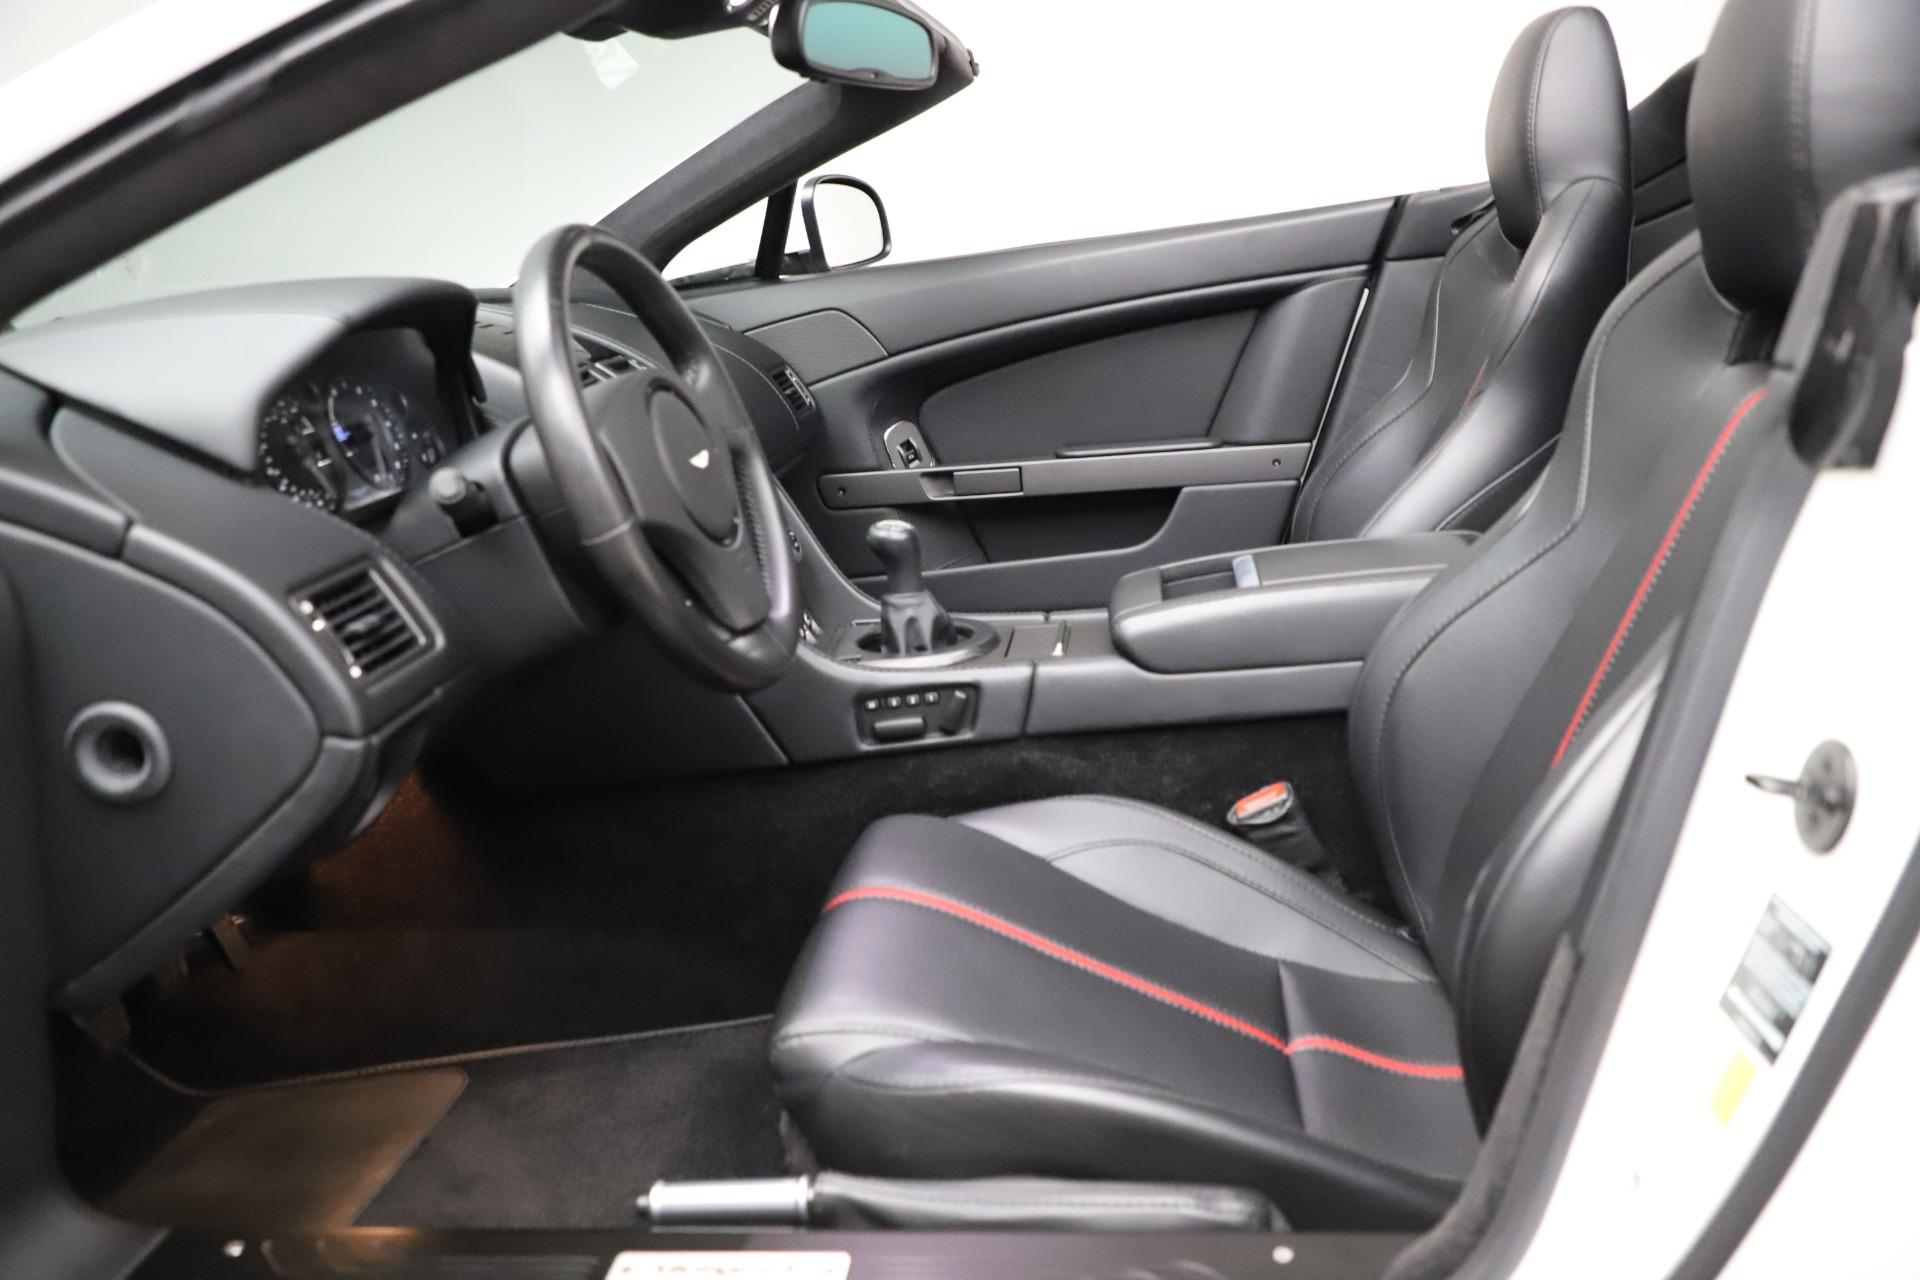 New-2015-Aston-Martin-Vantage-GT-GT-Roadster